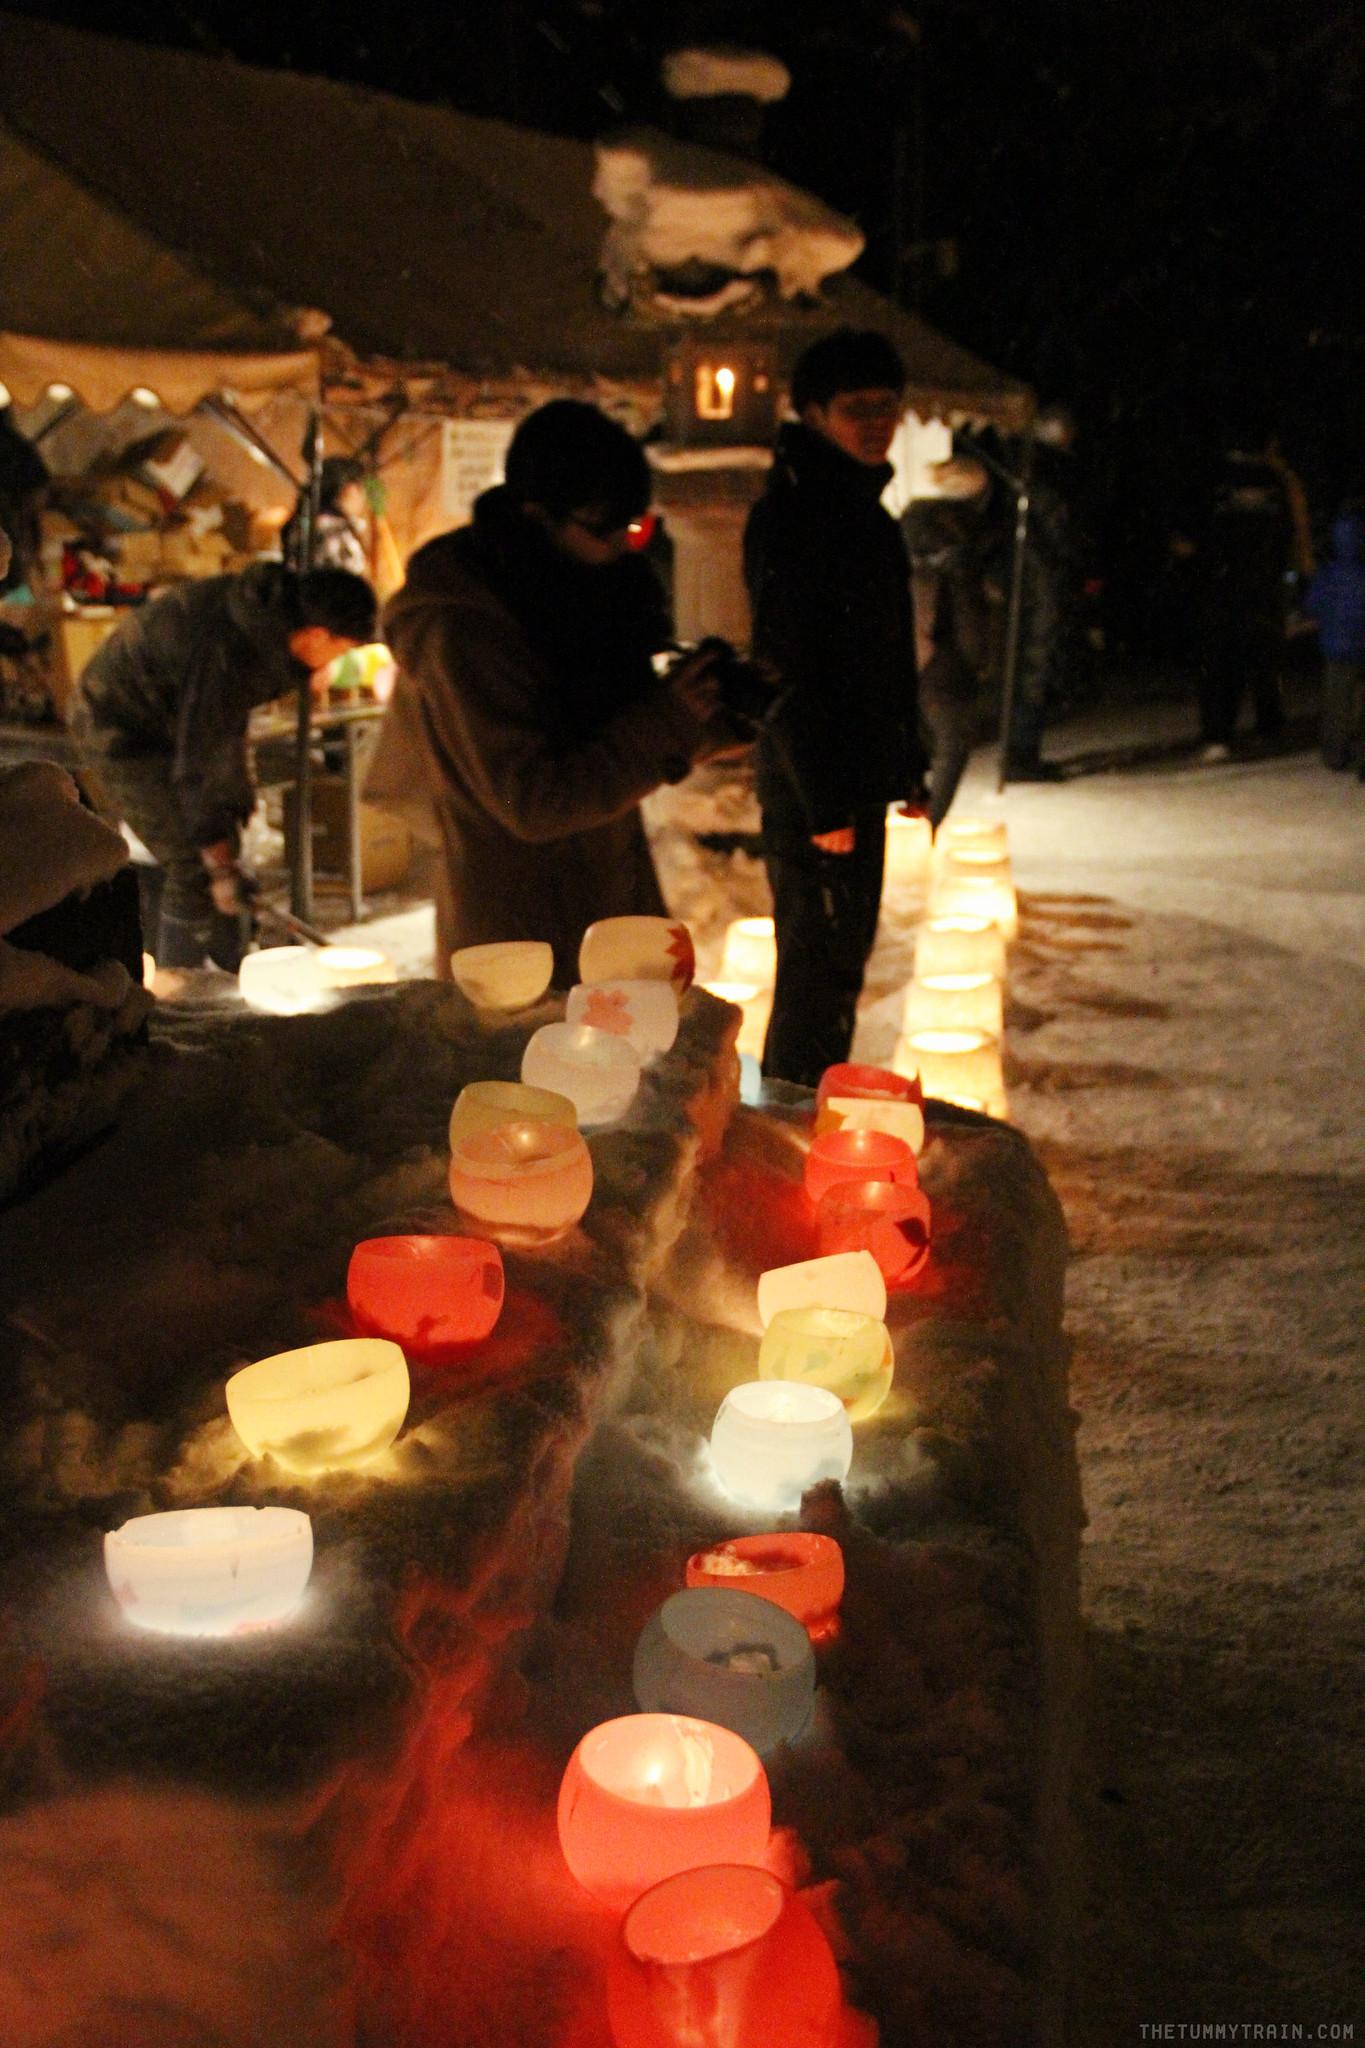 32762551282 026decbff5 k - Sapporo Snow And Smile: 8 Unforgettable Winter Experiences in Sapporo City